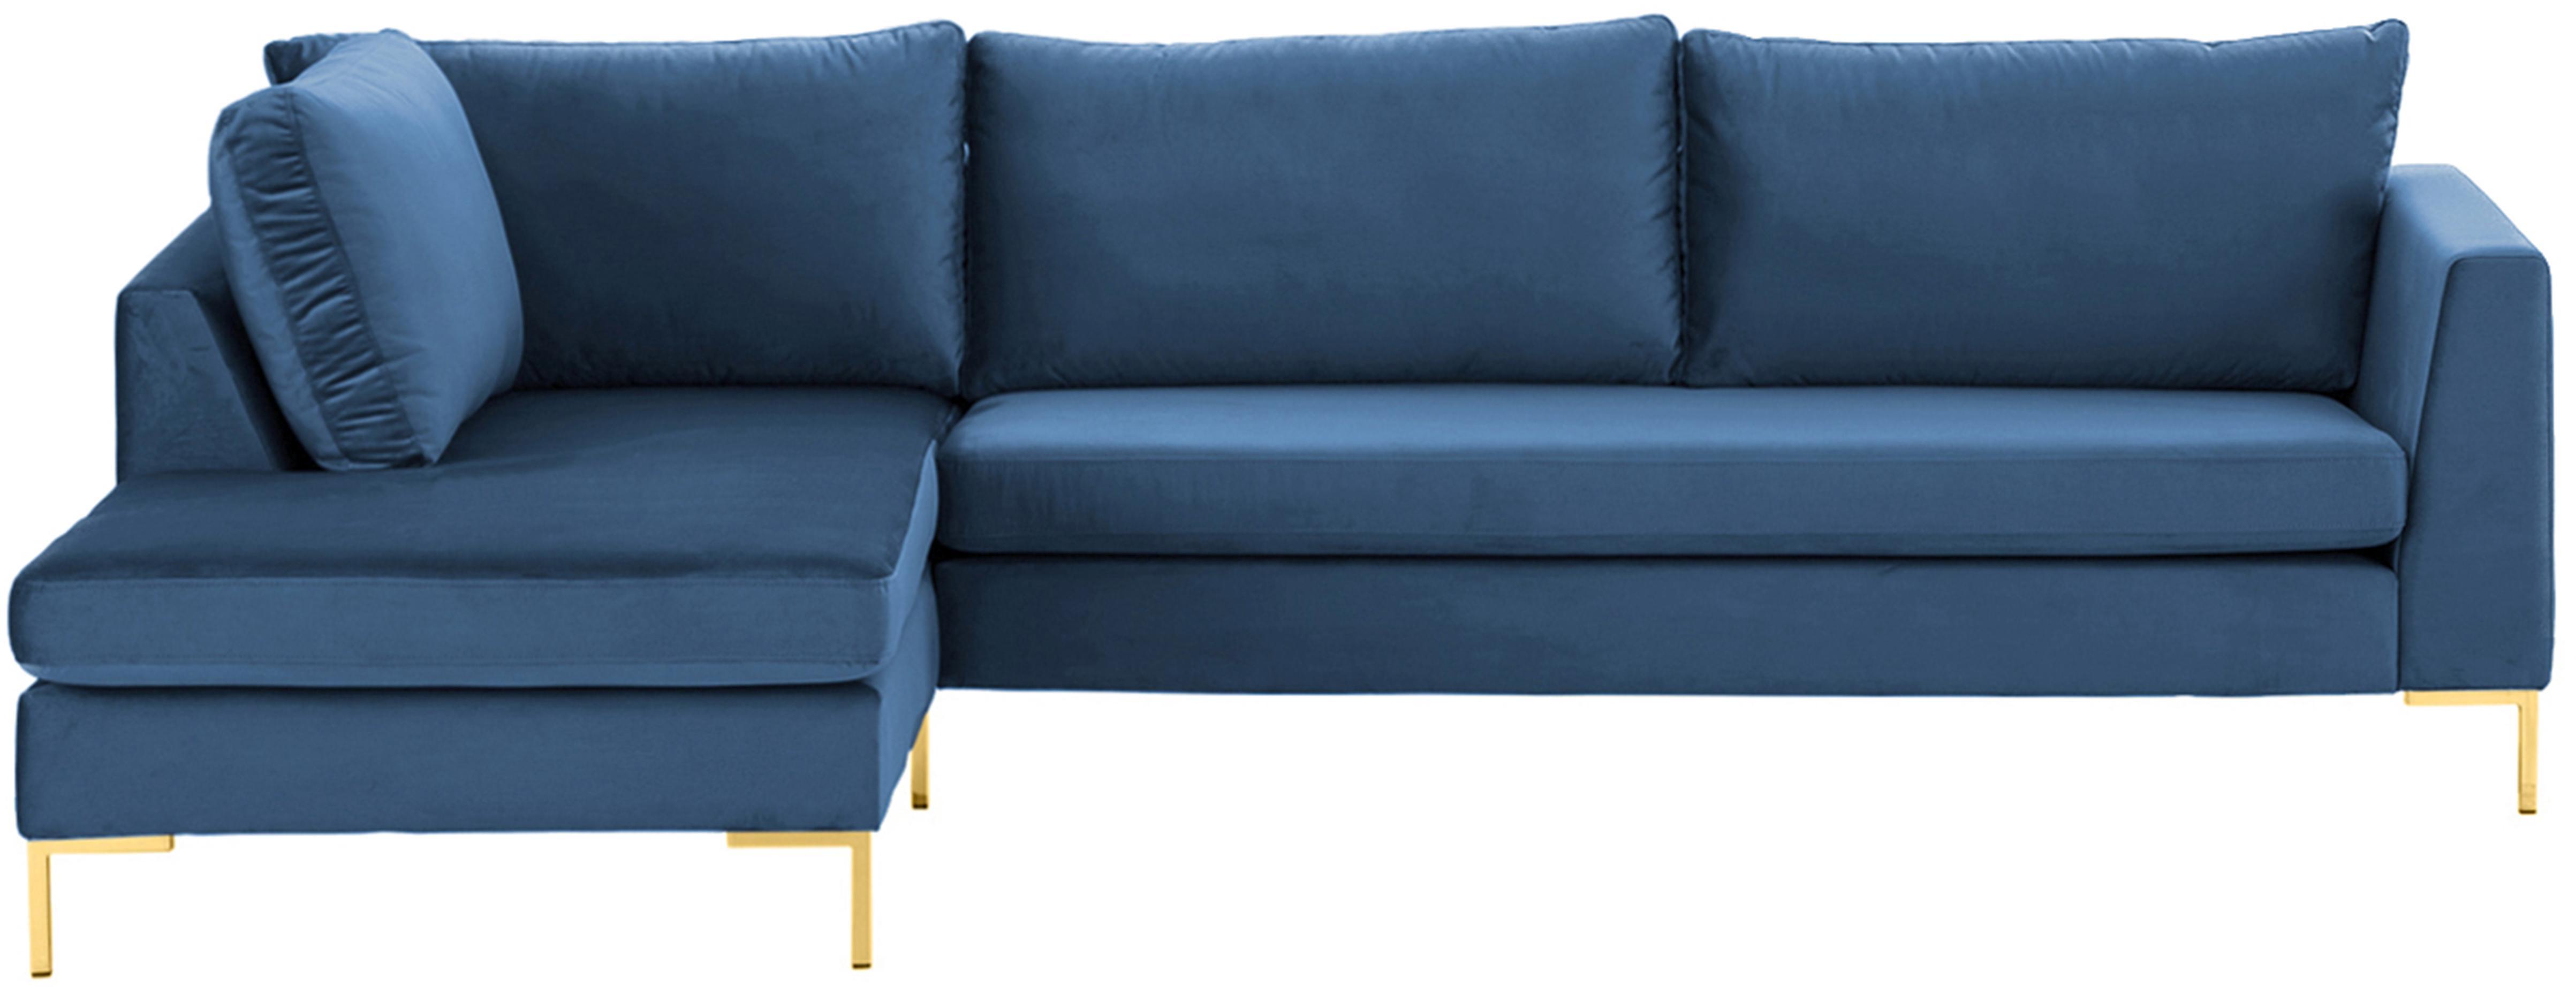 Samt-Ecksofa Luna, Bezug: Samt (Polyester) Der hoch, Gestell: Massives Buchenholz, Samt Blau, Gold, B 280 x T 184 cm